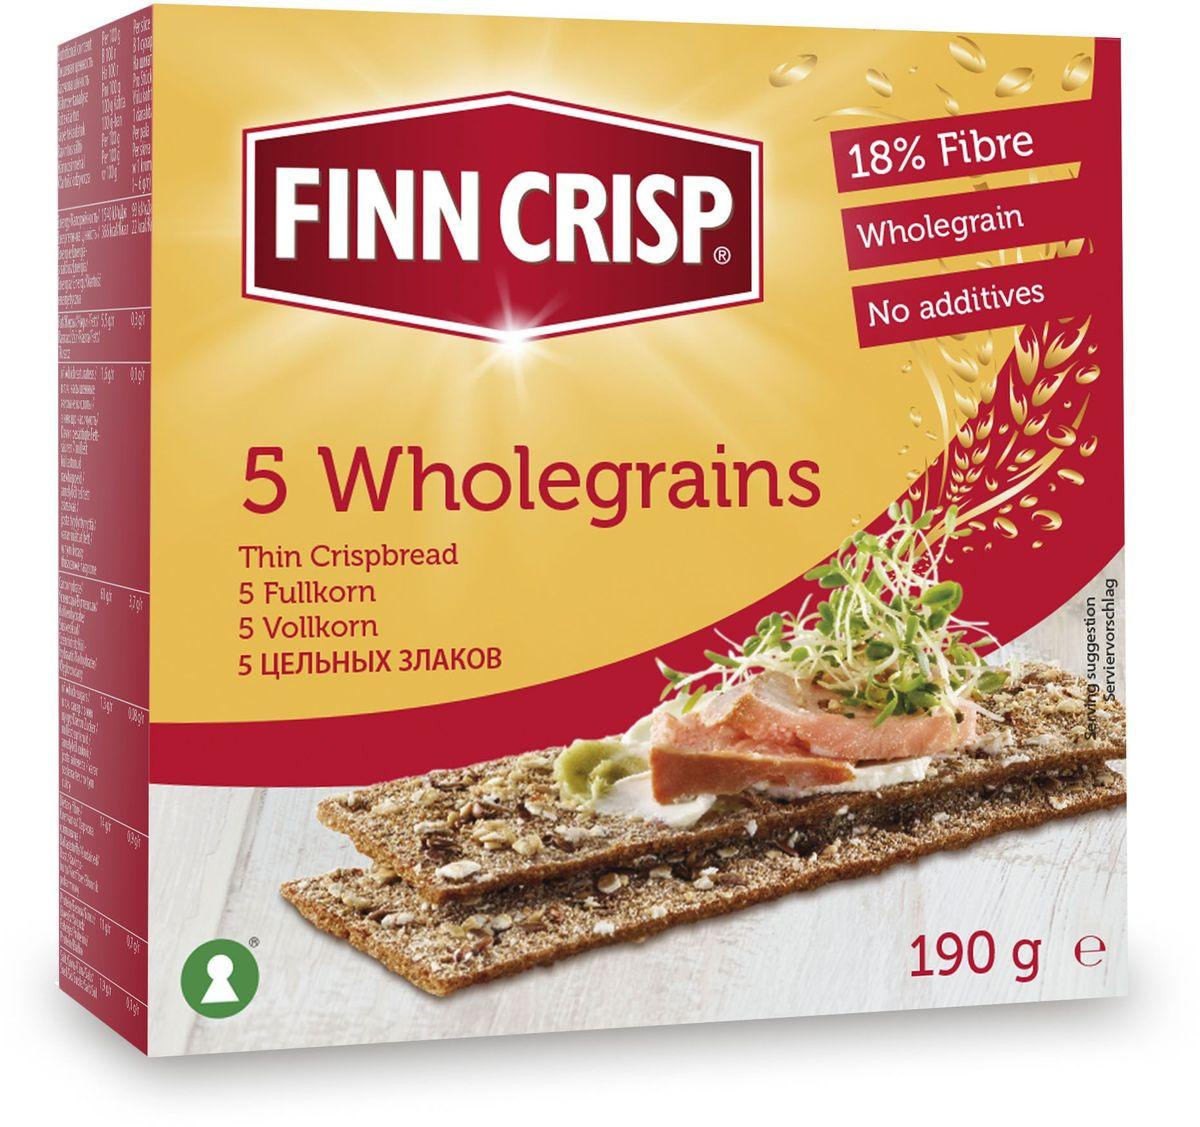 Finn Crisp 5 Wholegrain хлебцы 5 цельных злаков, 190 г finn crisp traditional хлебцы традиционные 200 г